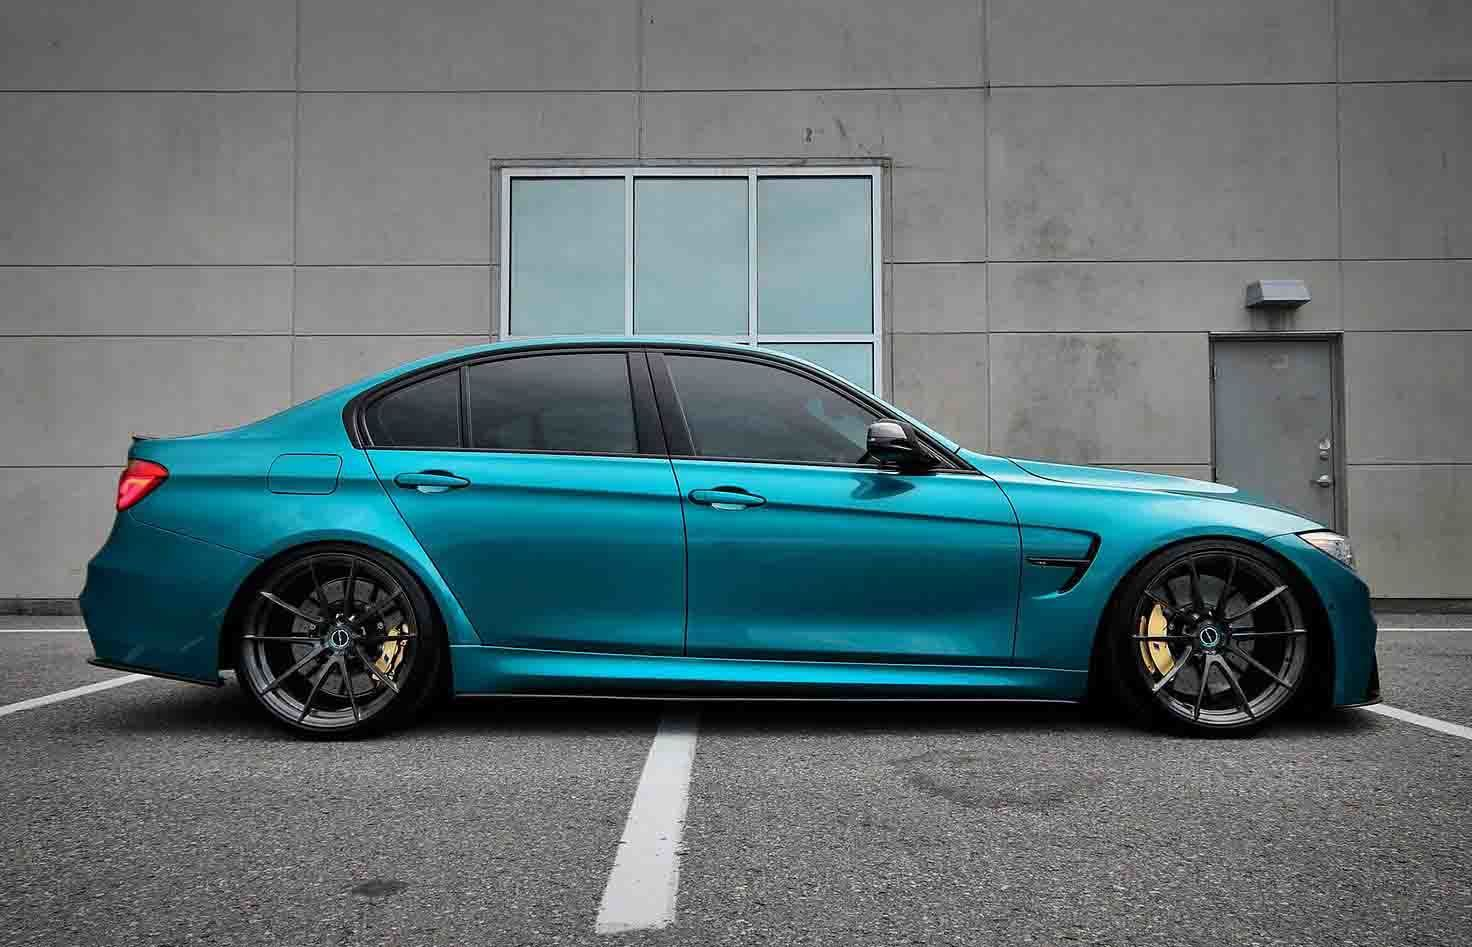 images-products-1-2398-232974686-atlantis-blue-m3-f80-bmw-brixton-forged-wr3-ultrasport-wheels-1-piece-concave-smoke-black-06-180.jpg